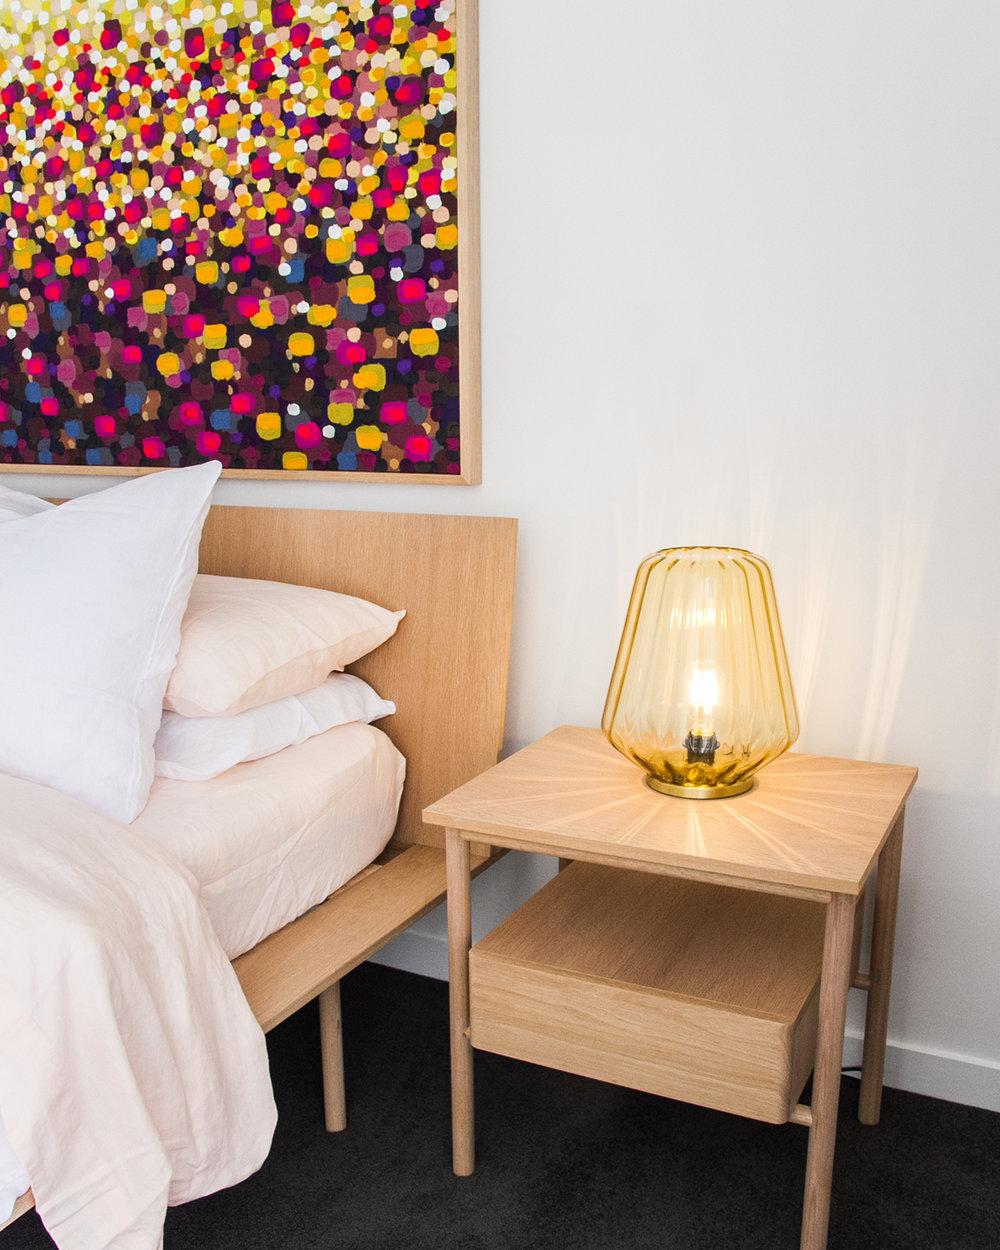 Kira and Kira - Gold Coast Property Styling - Home Interiors - Furniture DesignKira and Kira Gold Coast Property Styling Home Furniture IMG_6145- small.jpg